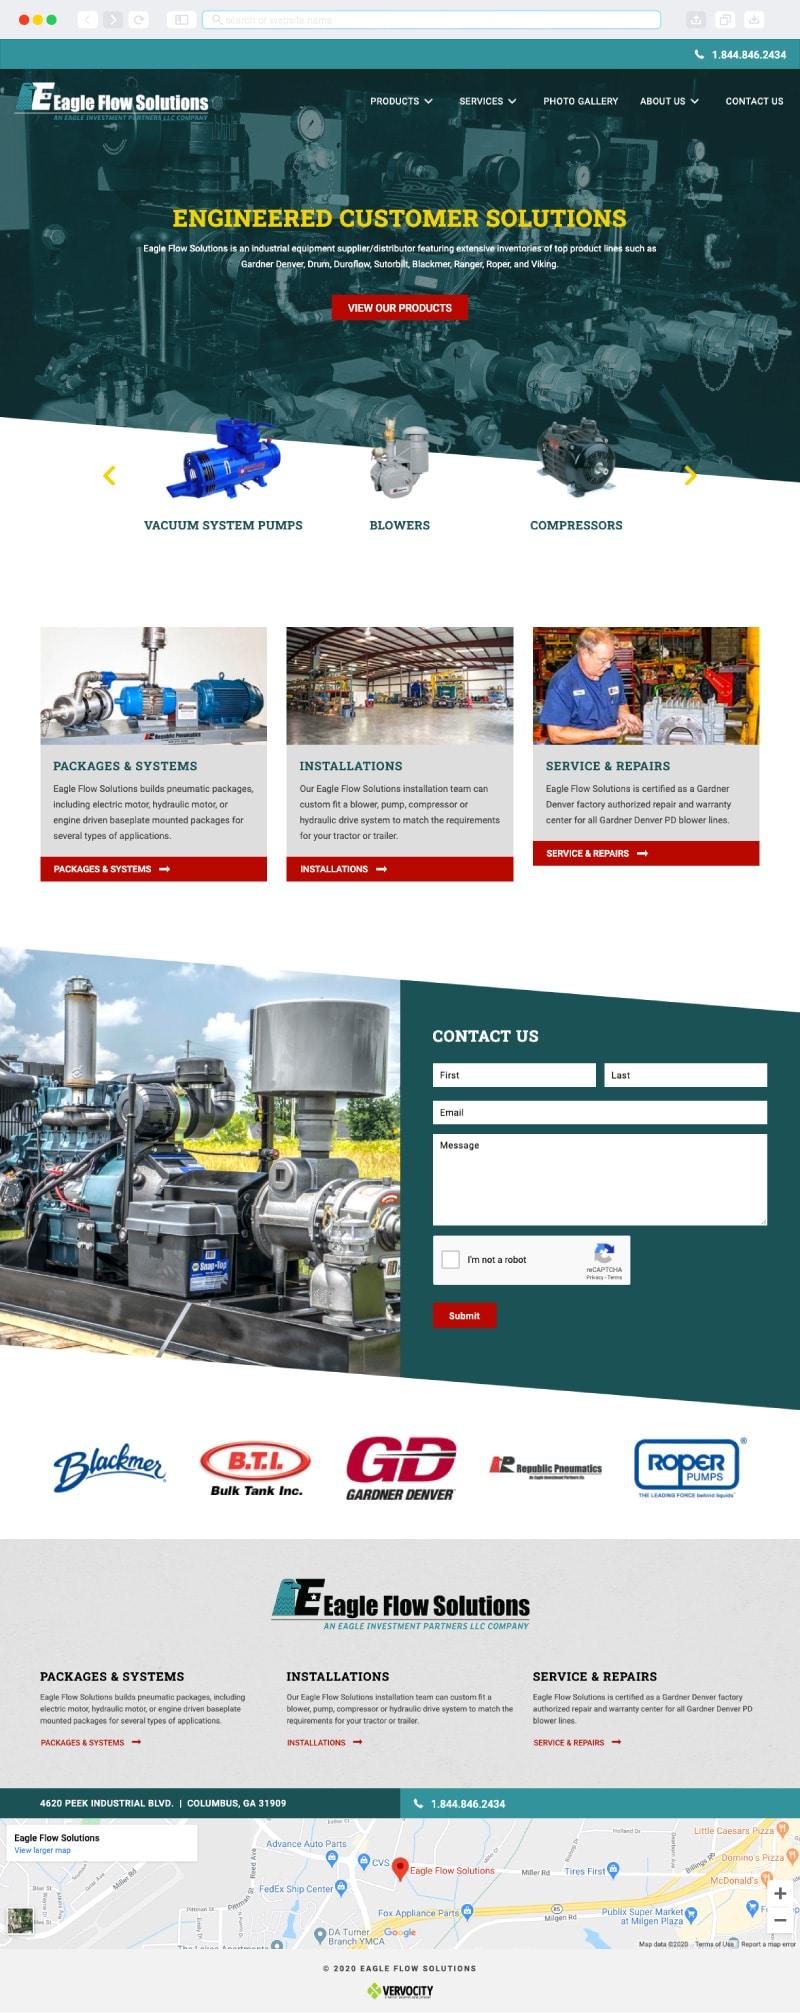 Eagle Flow Solutions Homepage   Vervocity